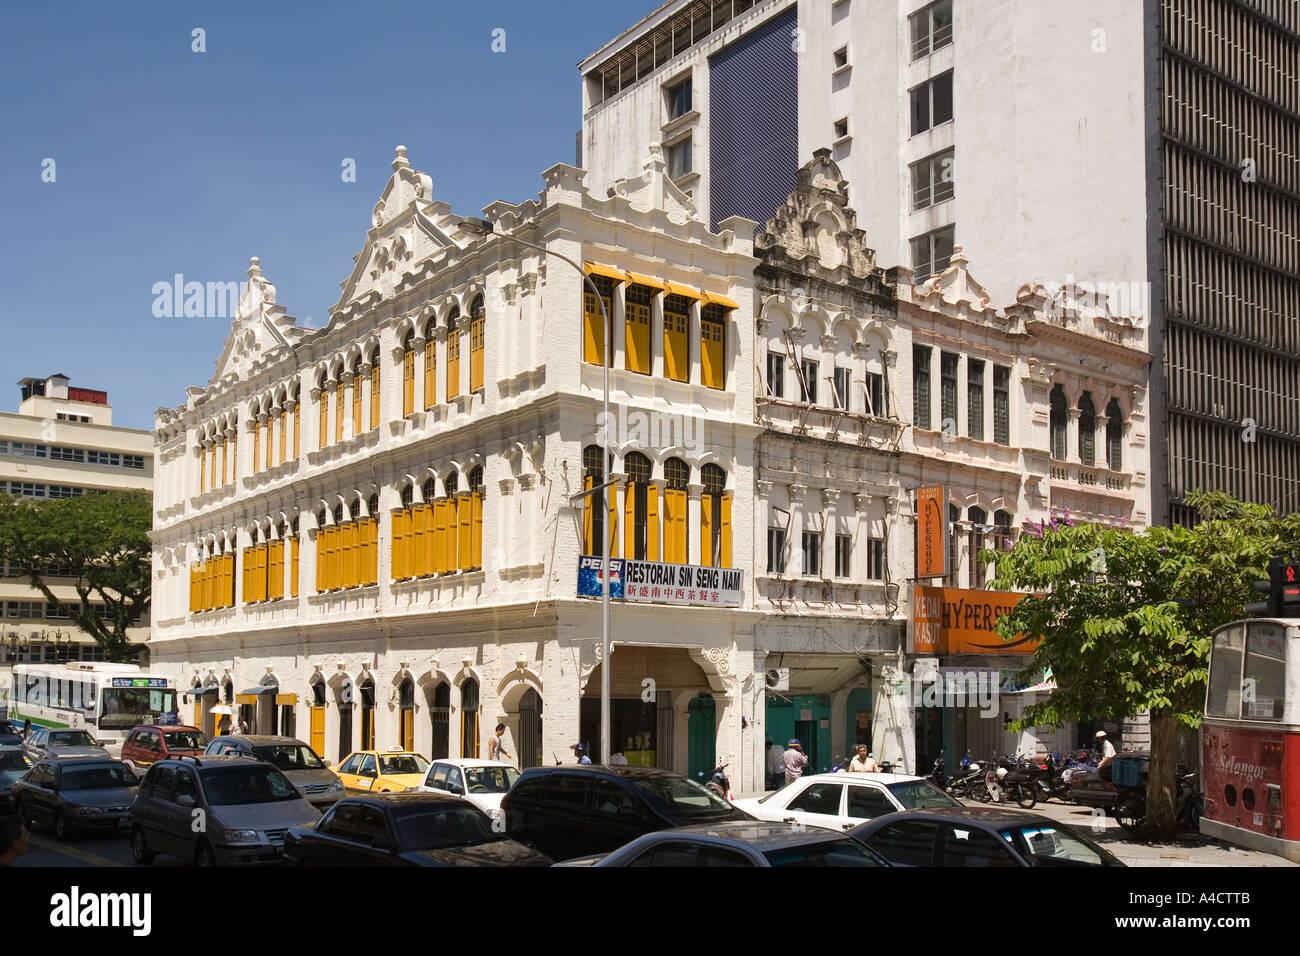 Malaysia Kuala Lumpur Market Square Sin Seng Nam restaurant shophouse building - Stock Image